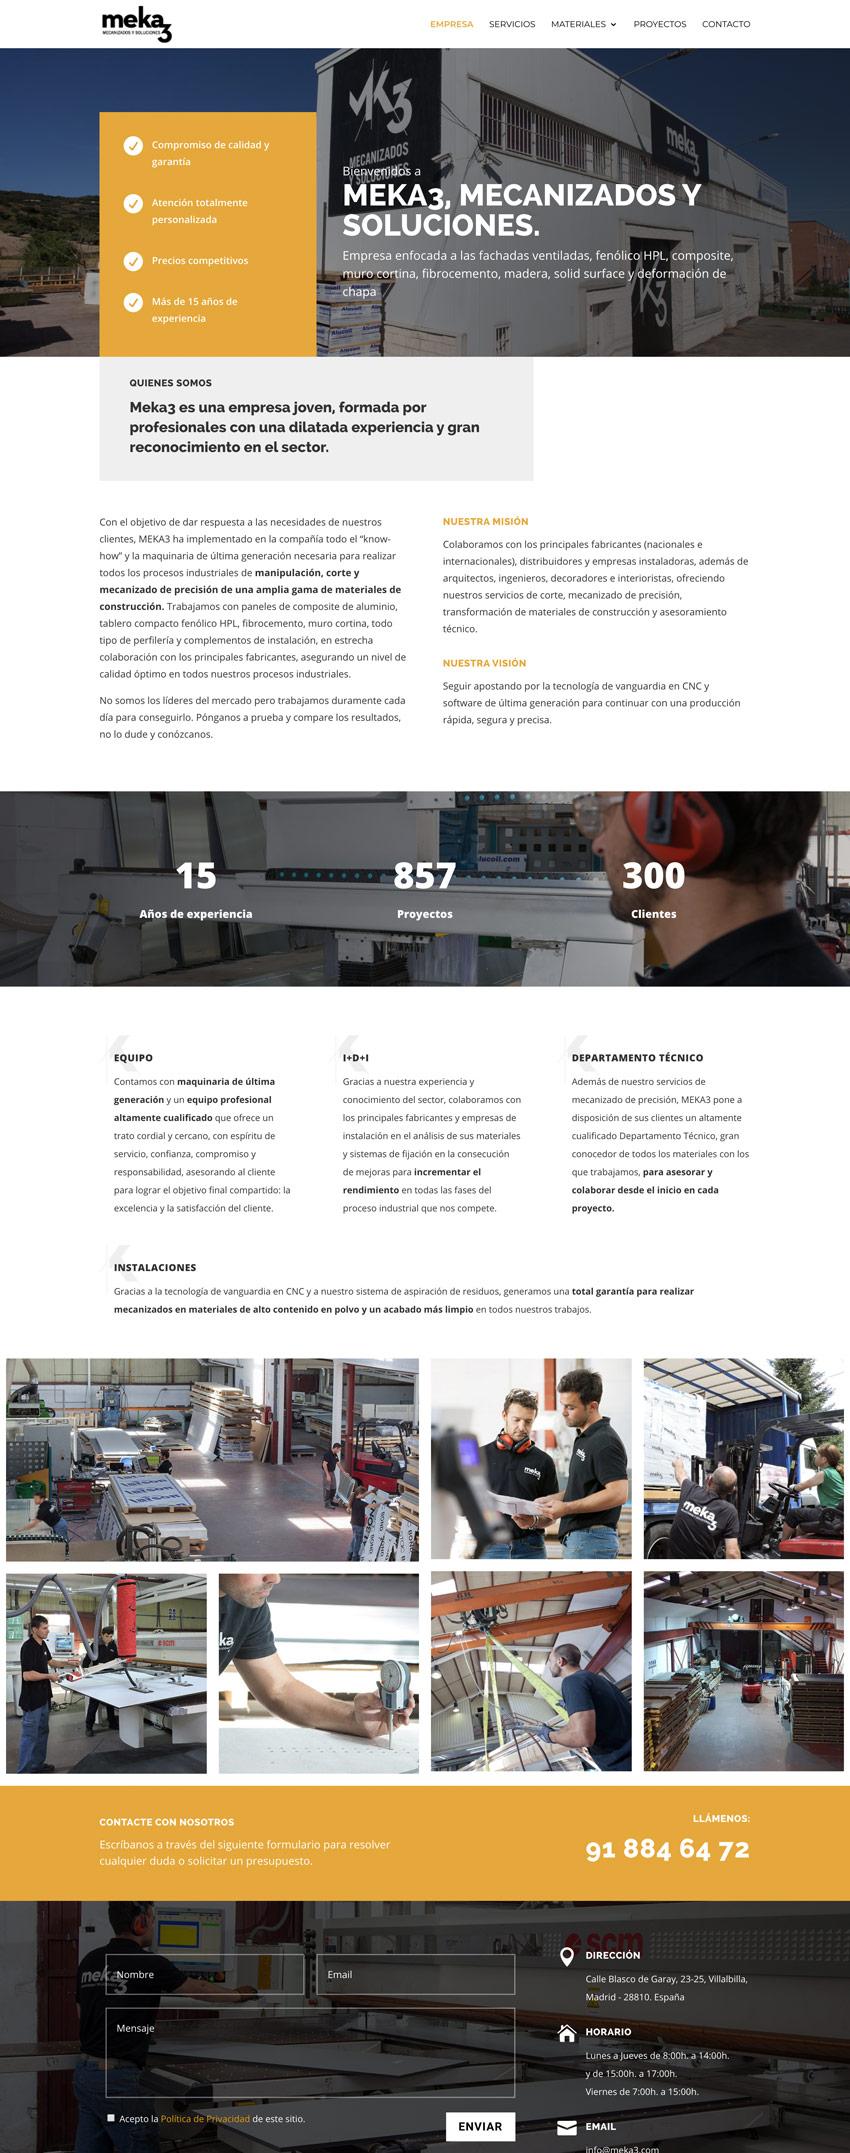 diseno web responsive meka3